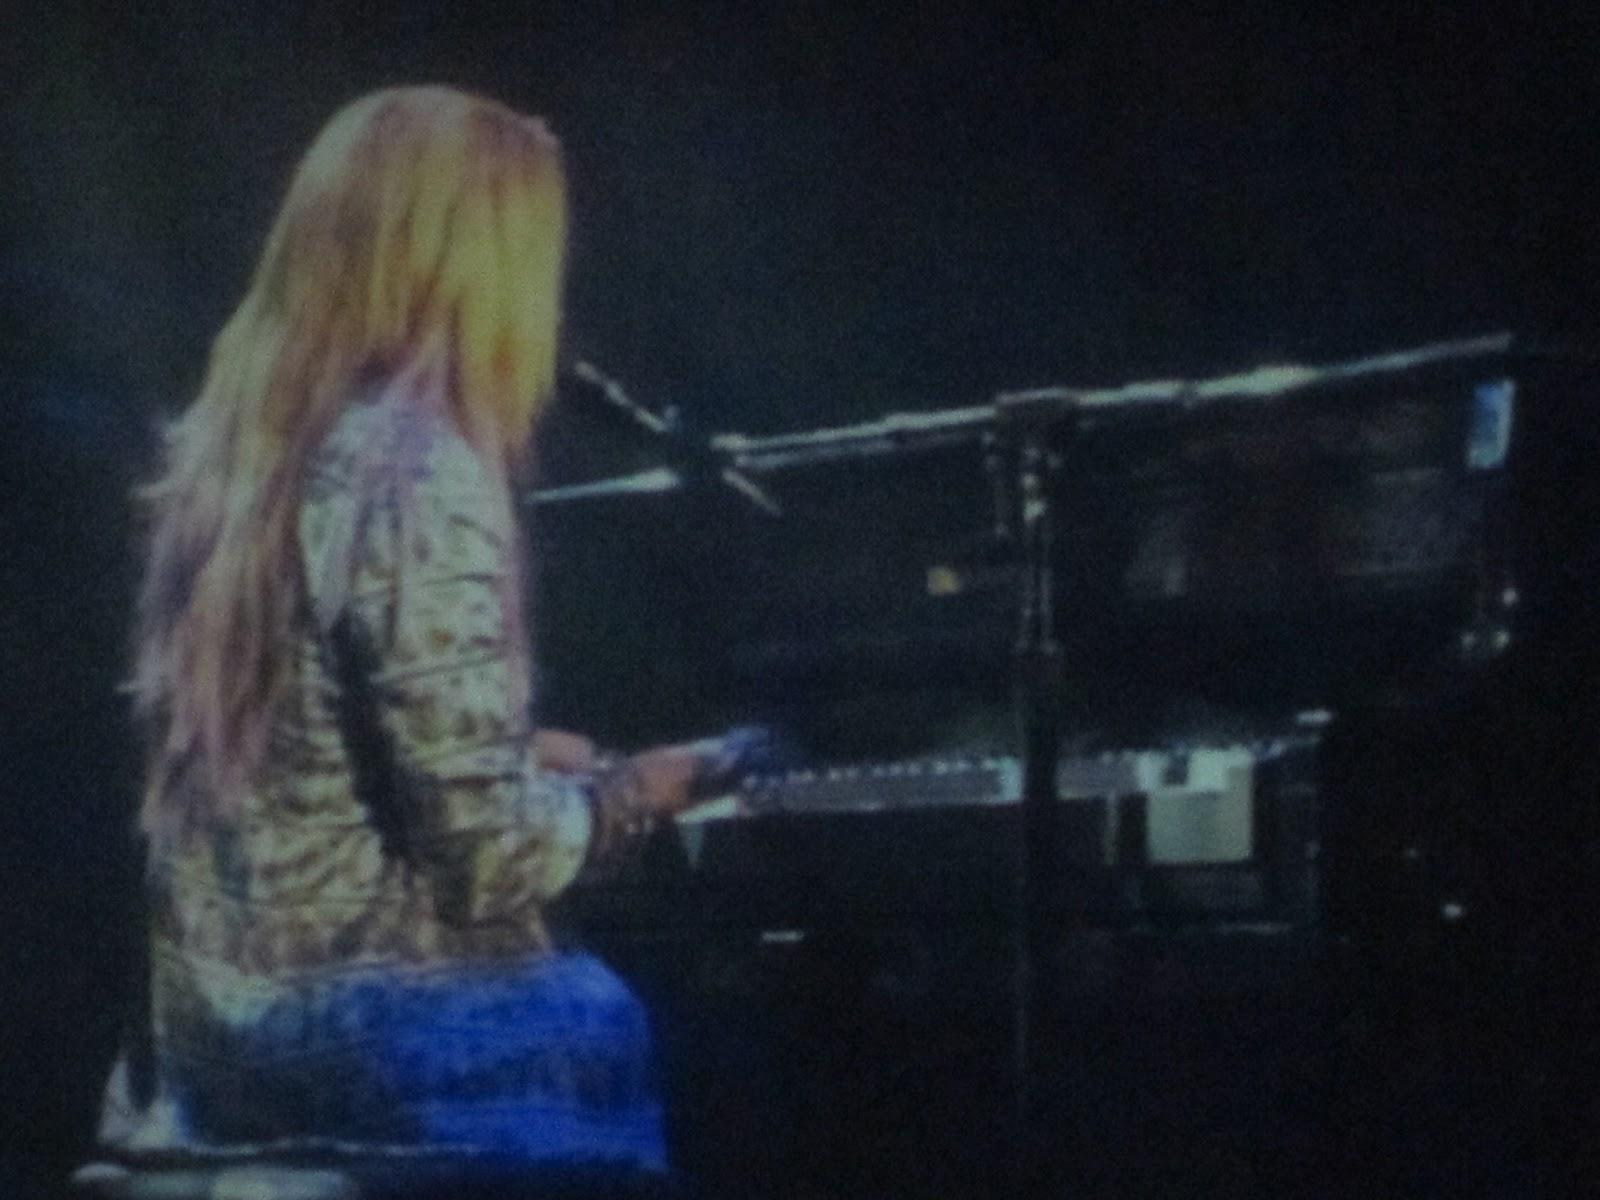 http://2.bp.blogspot.com/-A2GsxjVfxv8/T-dpySZCRBI/AAAAAAAAAa0/OWU76RWVra4/s1600/Demi+Lovato+12+052.JPG